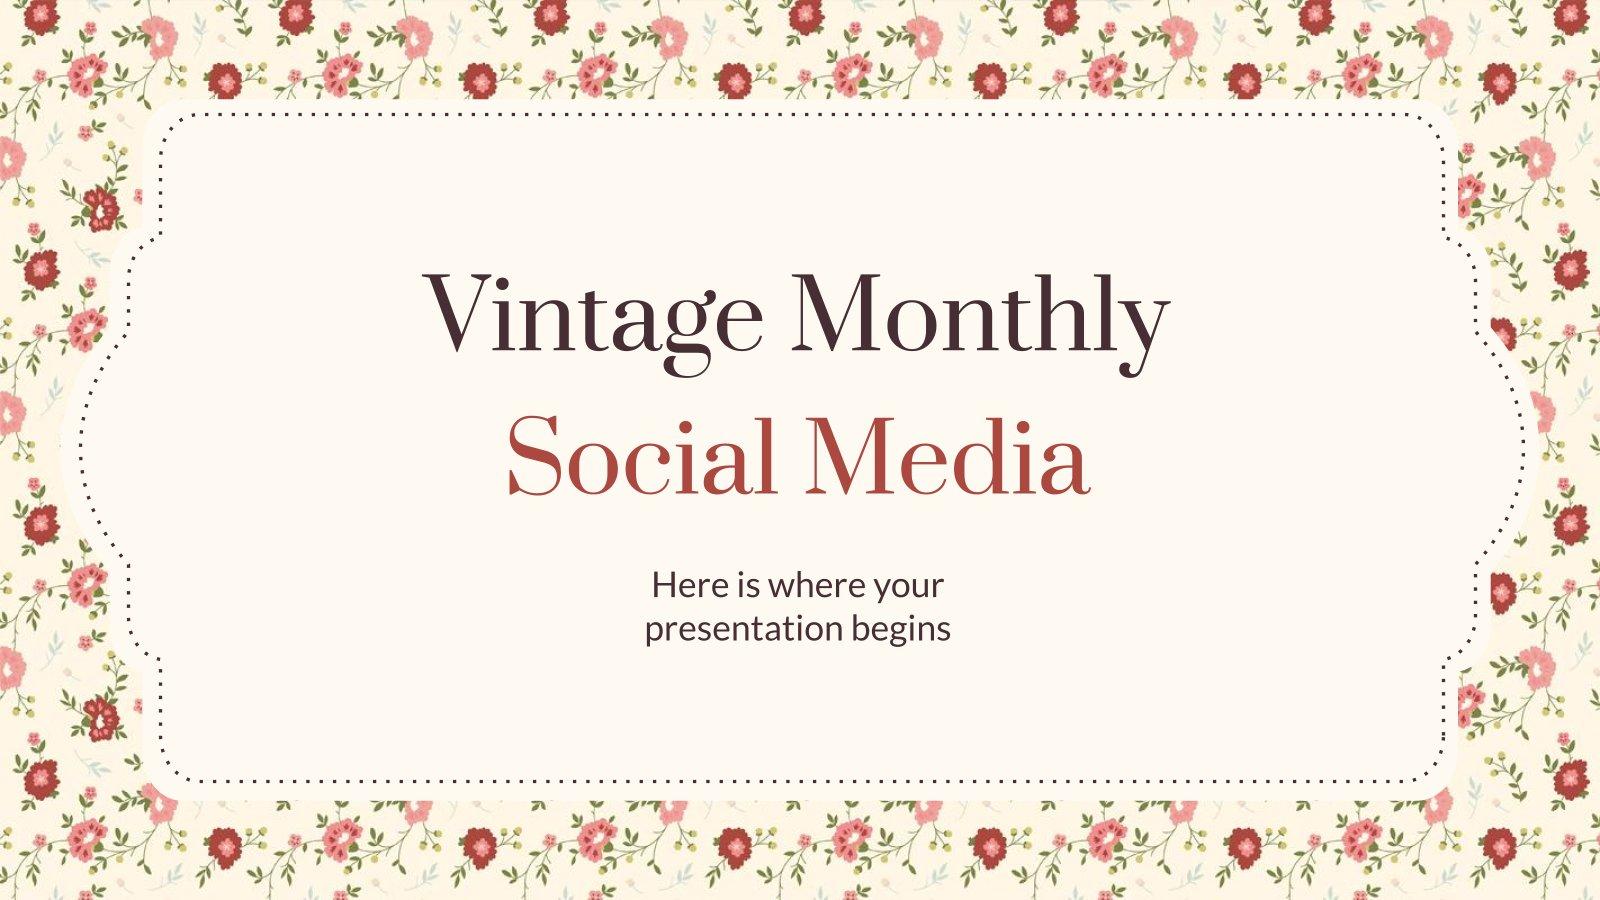 Vintage Monthly Social Media presentation template